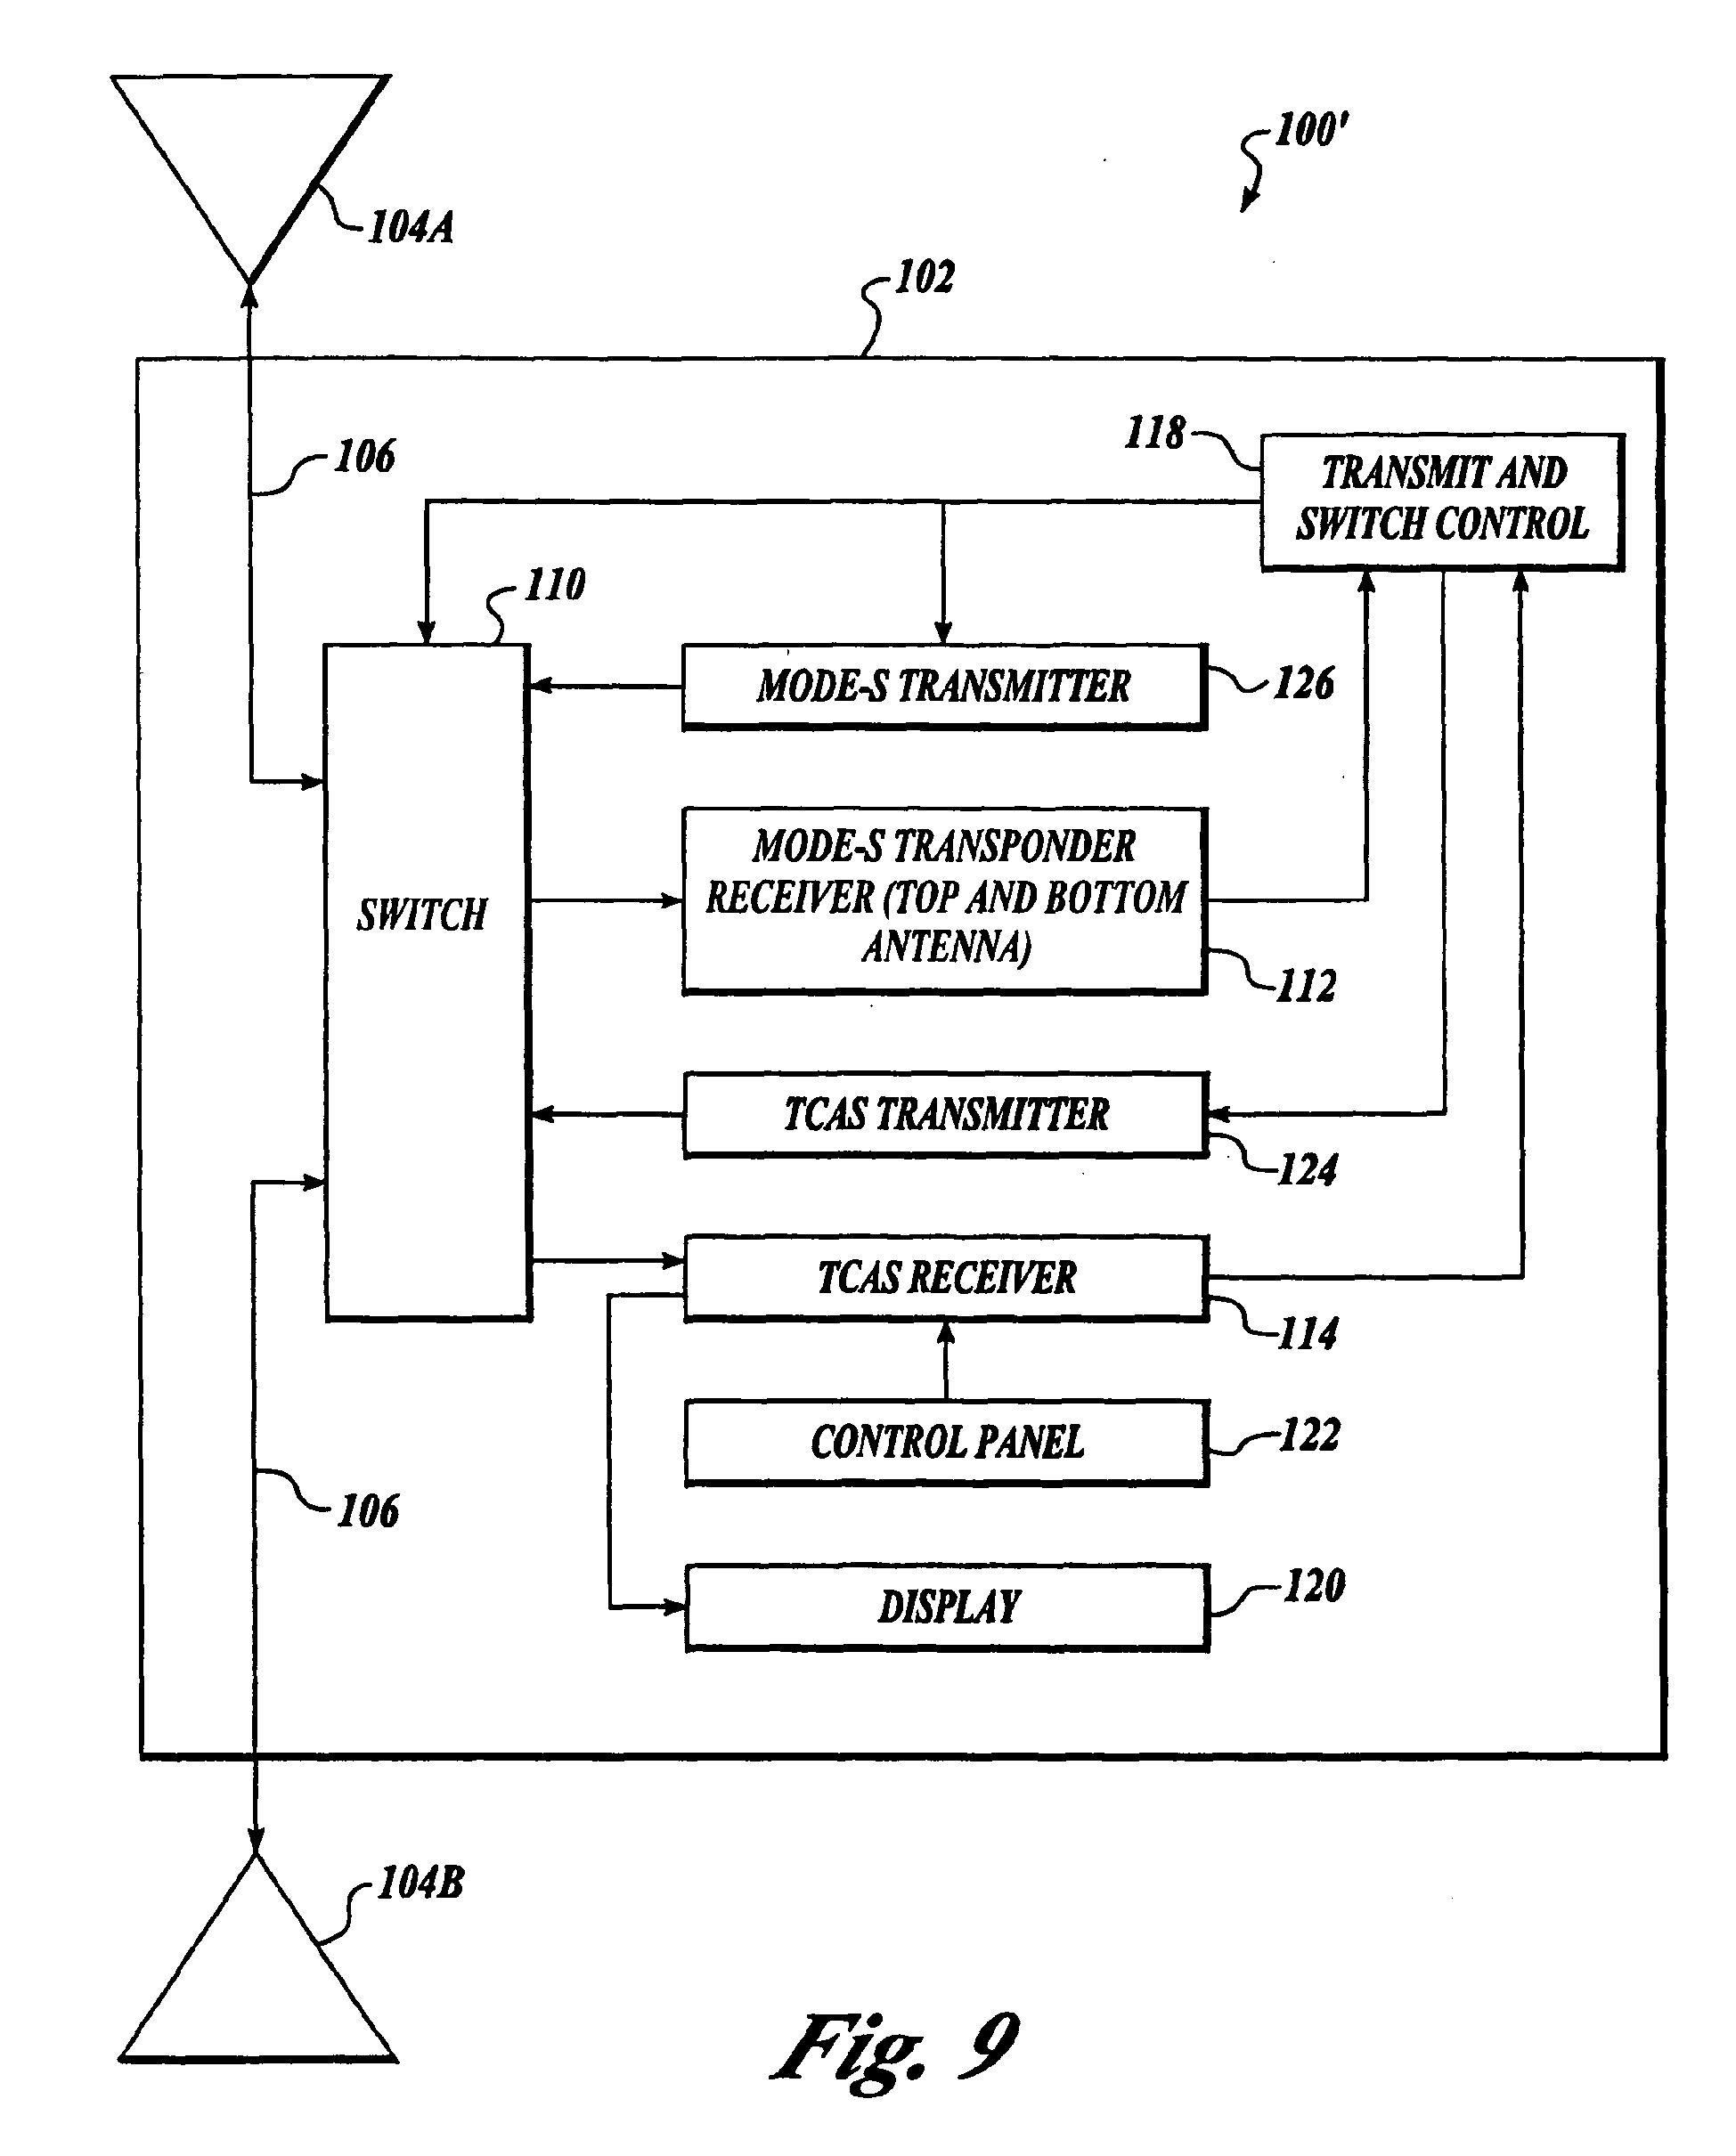 Diagram 802 11 Wiring Diagram Full Version Hd Quality Wiring Diagram Diagramsmaum Caditwergi It